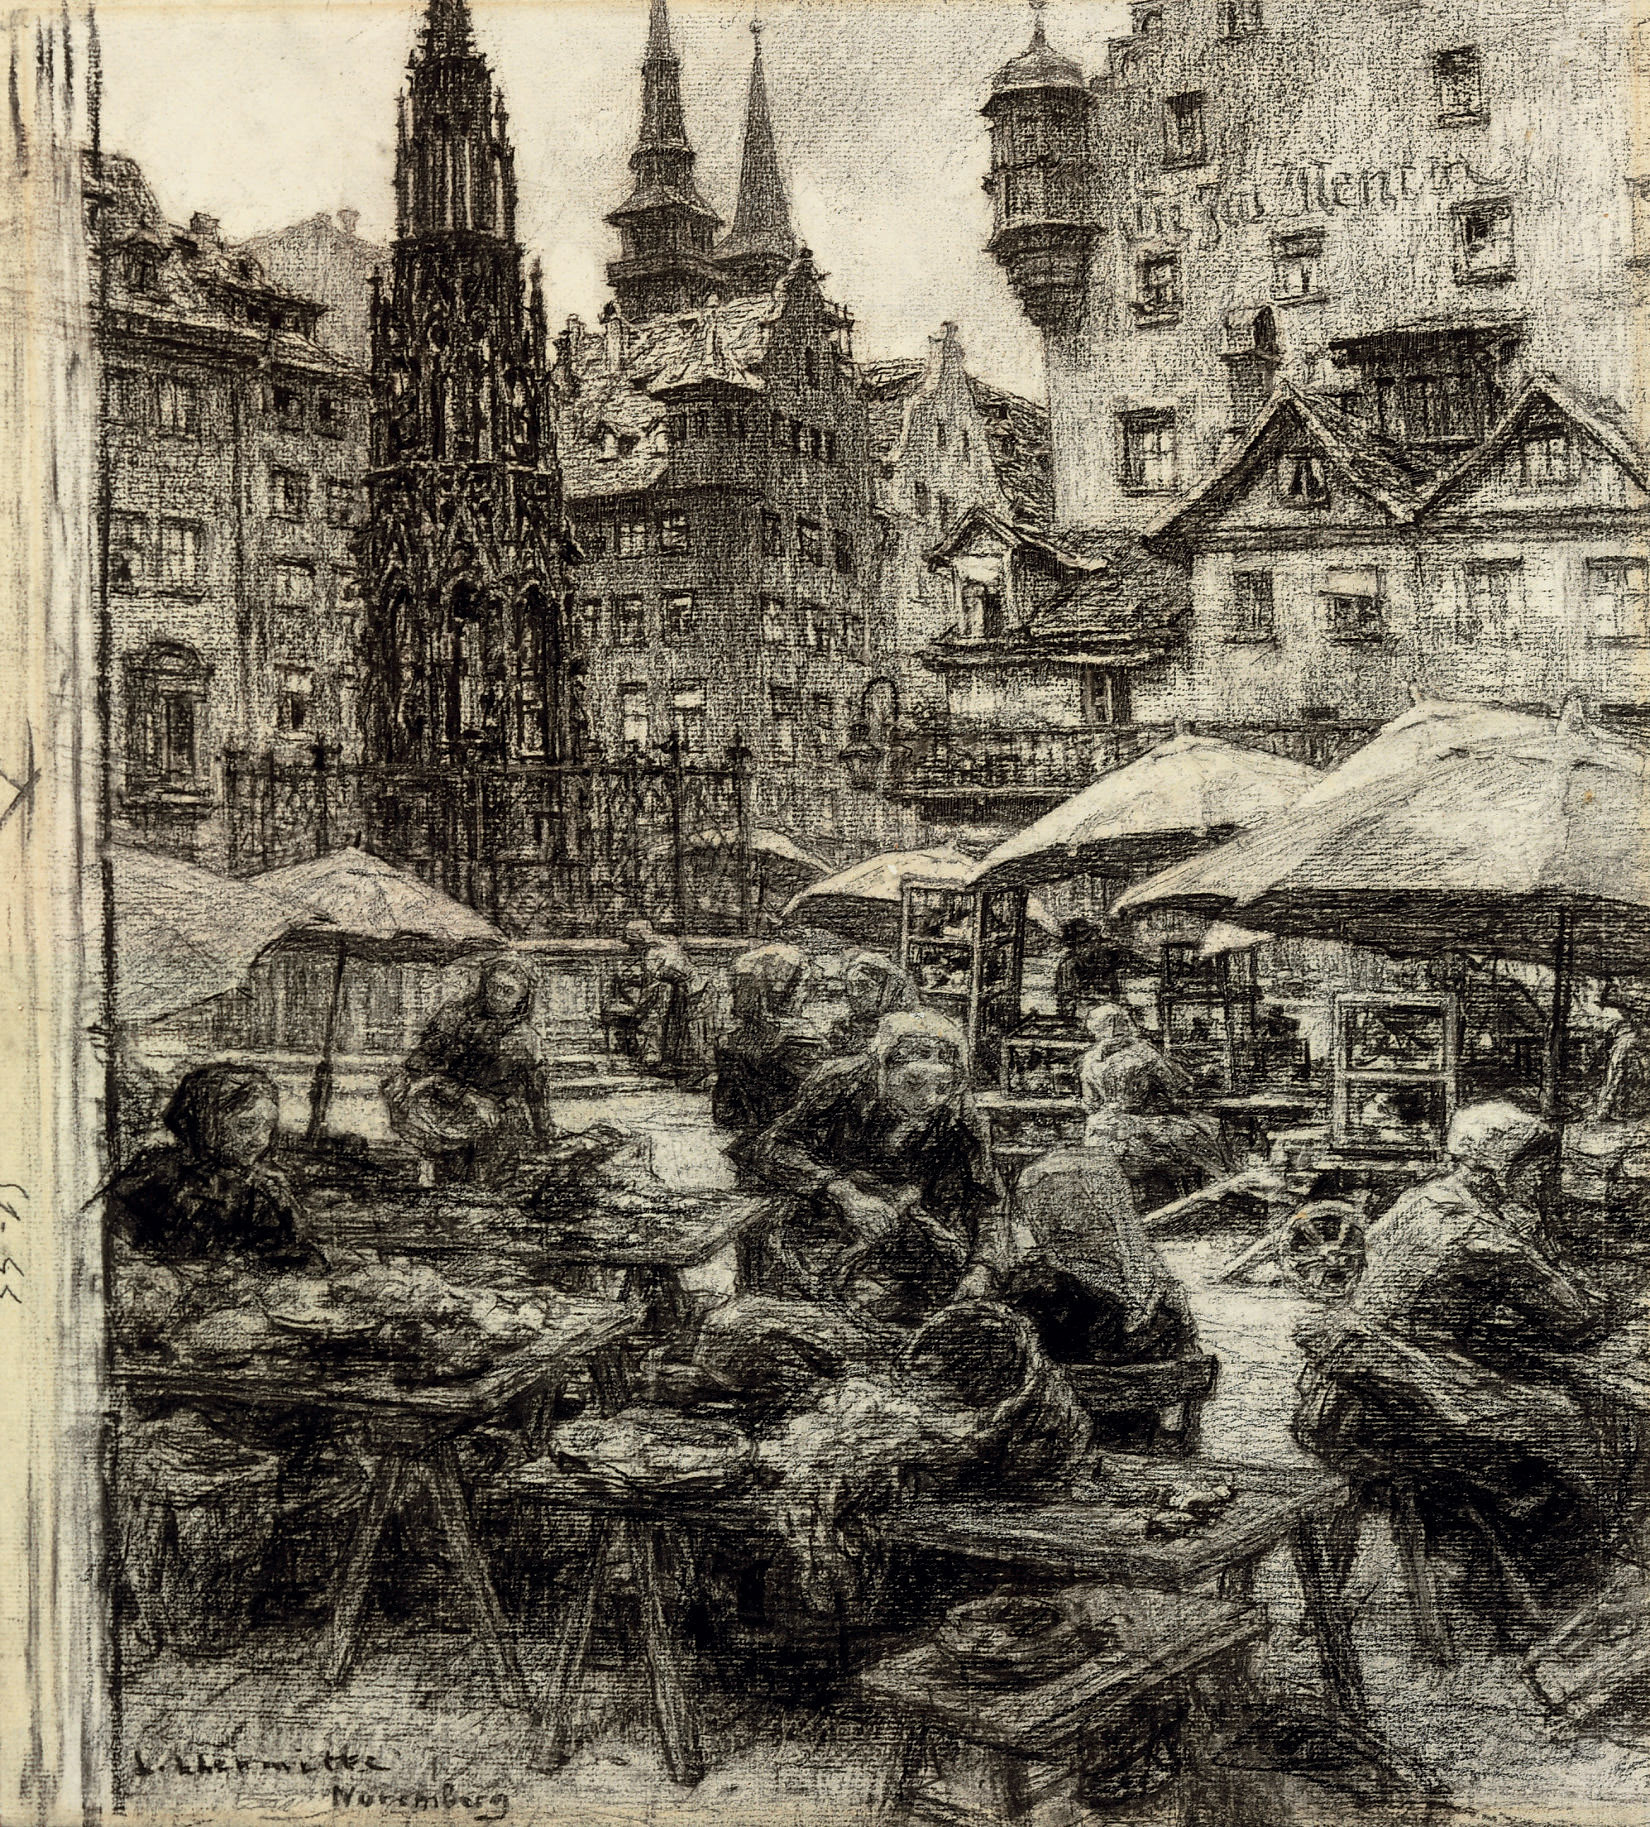 The market at Nuremberg